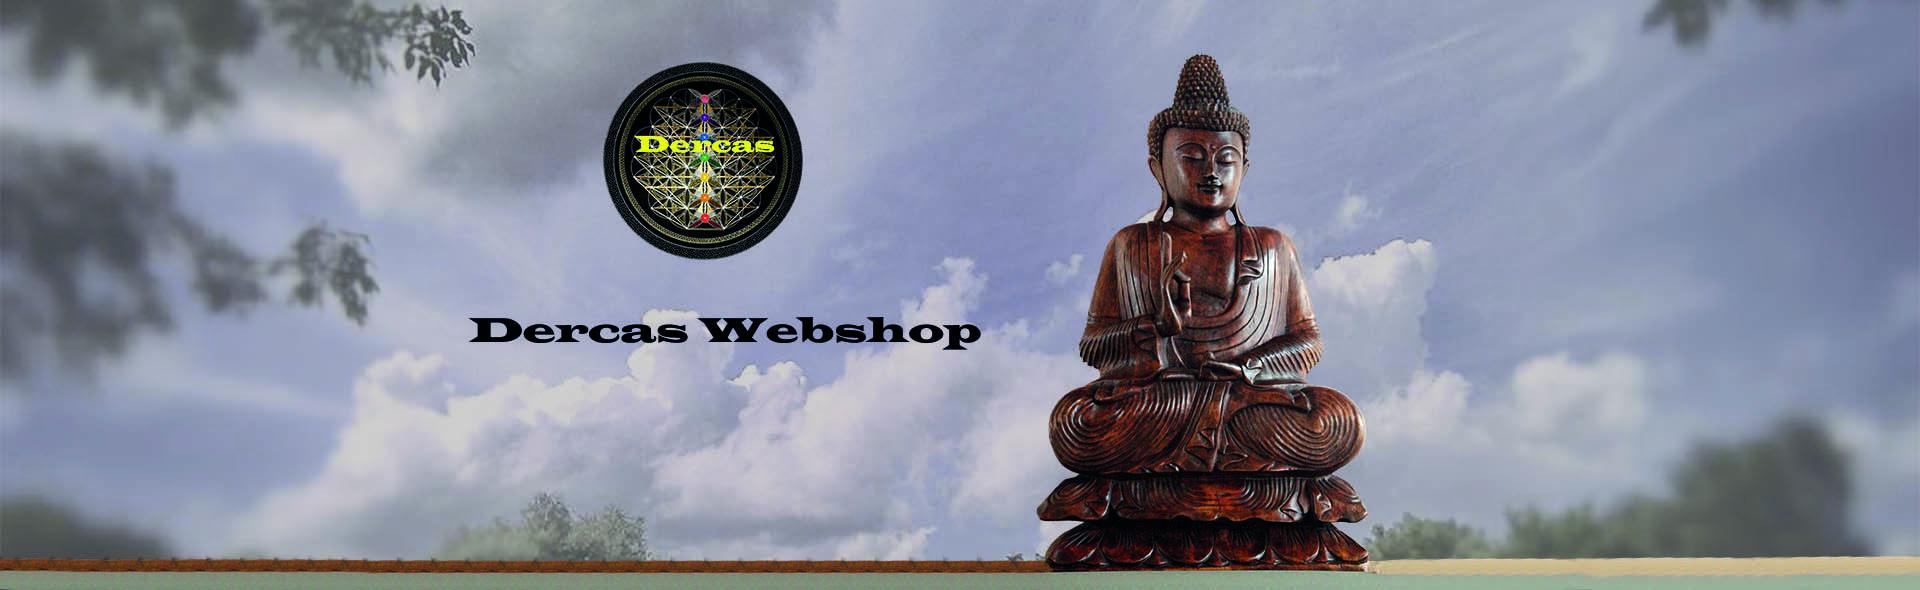 Dercas Webshop